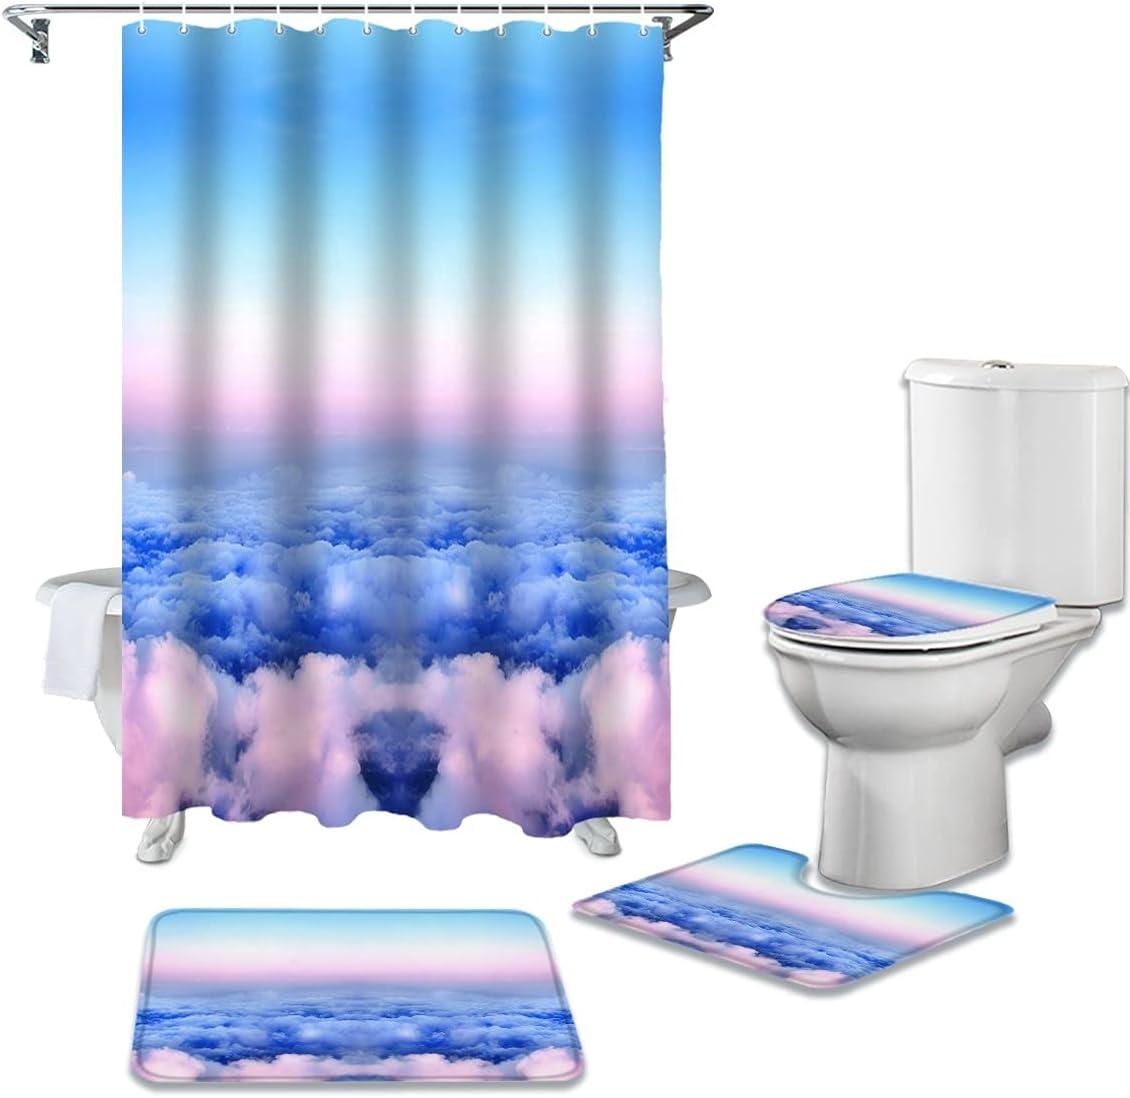 dodouna Beautiful Sky Clouds Bathroom Bath Sets Mat 1 year warranty Set Outlet SALE Curtain